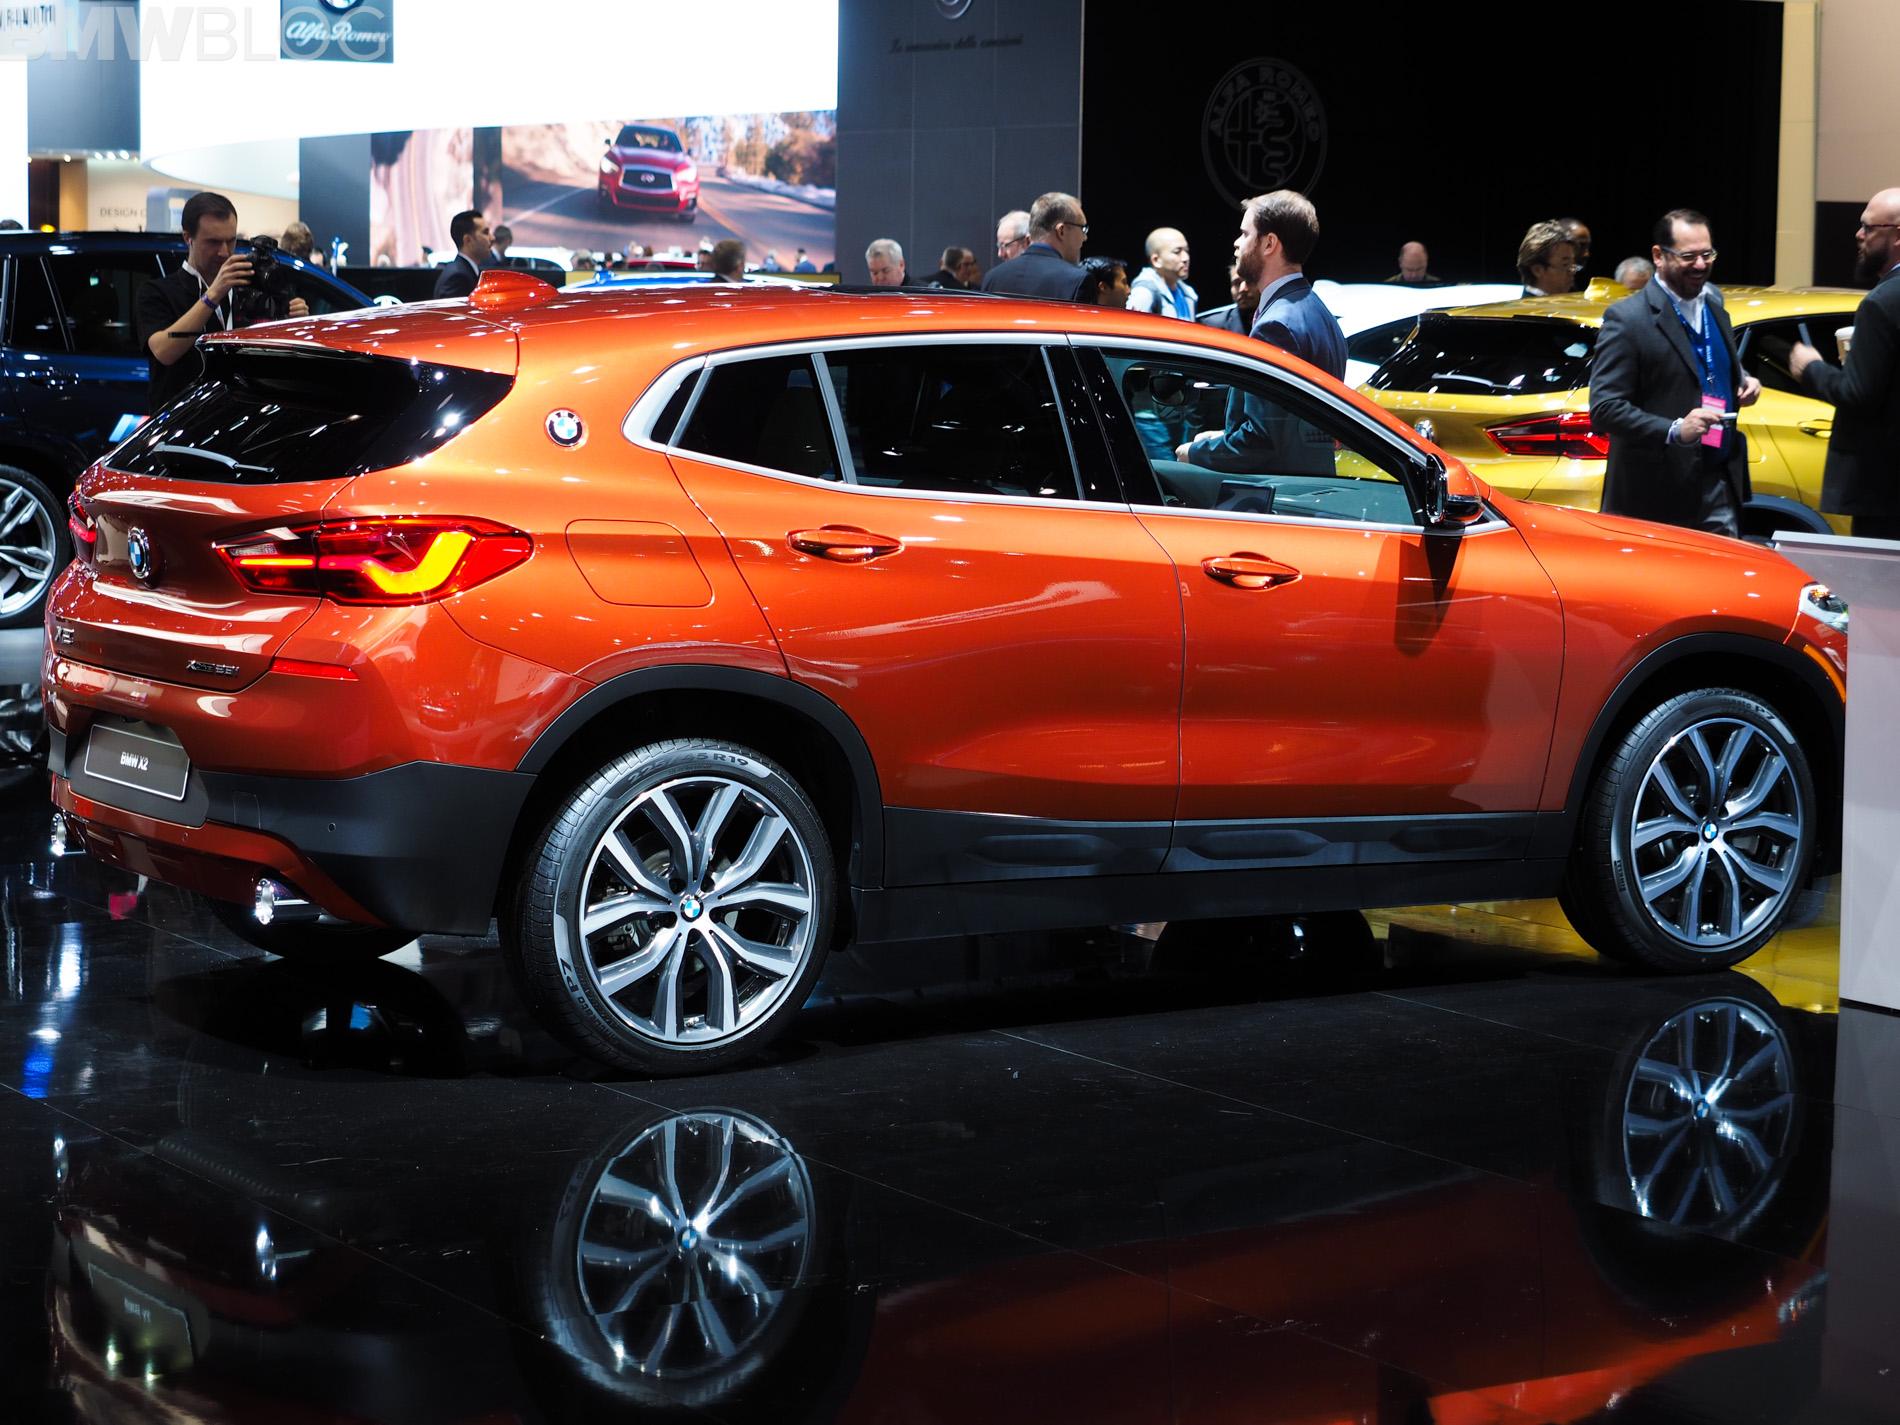 Orange Color 2018 Detroit Auto Show Bmw X2 In Sunset Orange